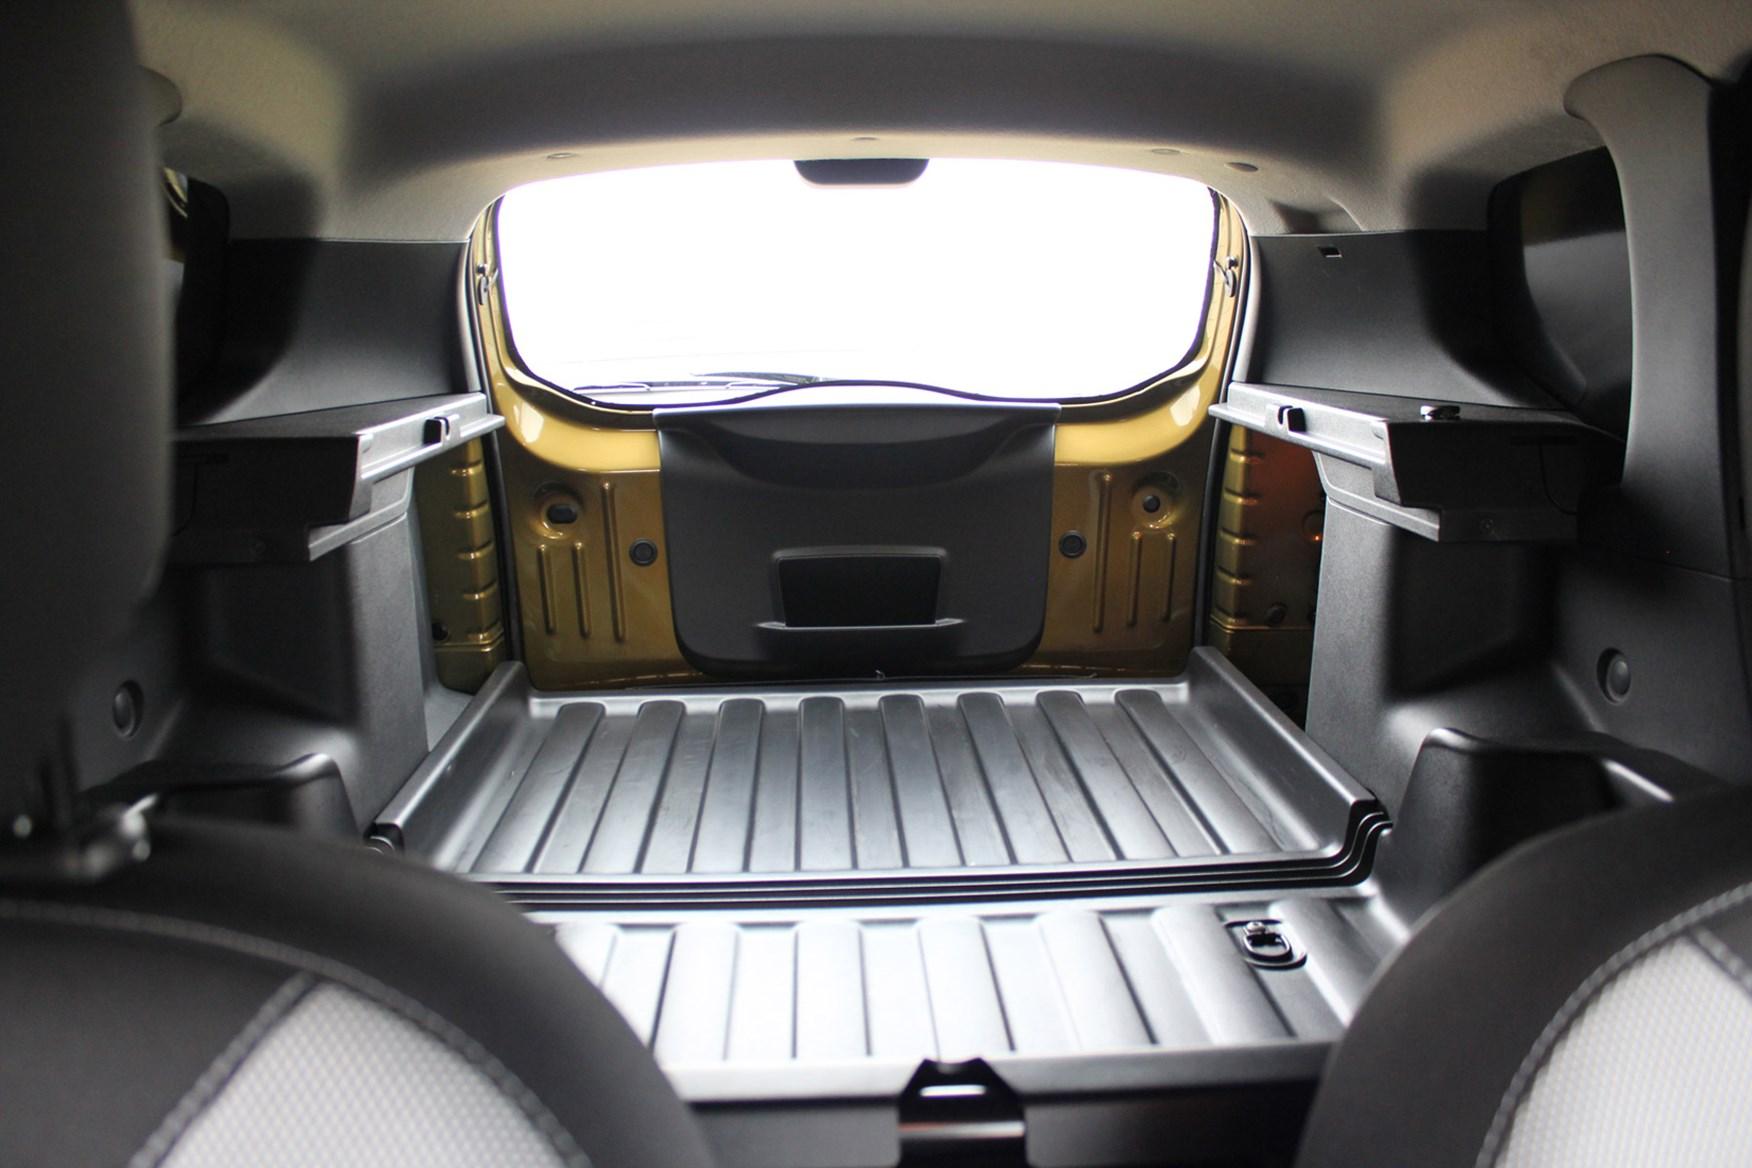 Dacia Duster full review on Parkers Vans - Laureate trim load area